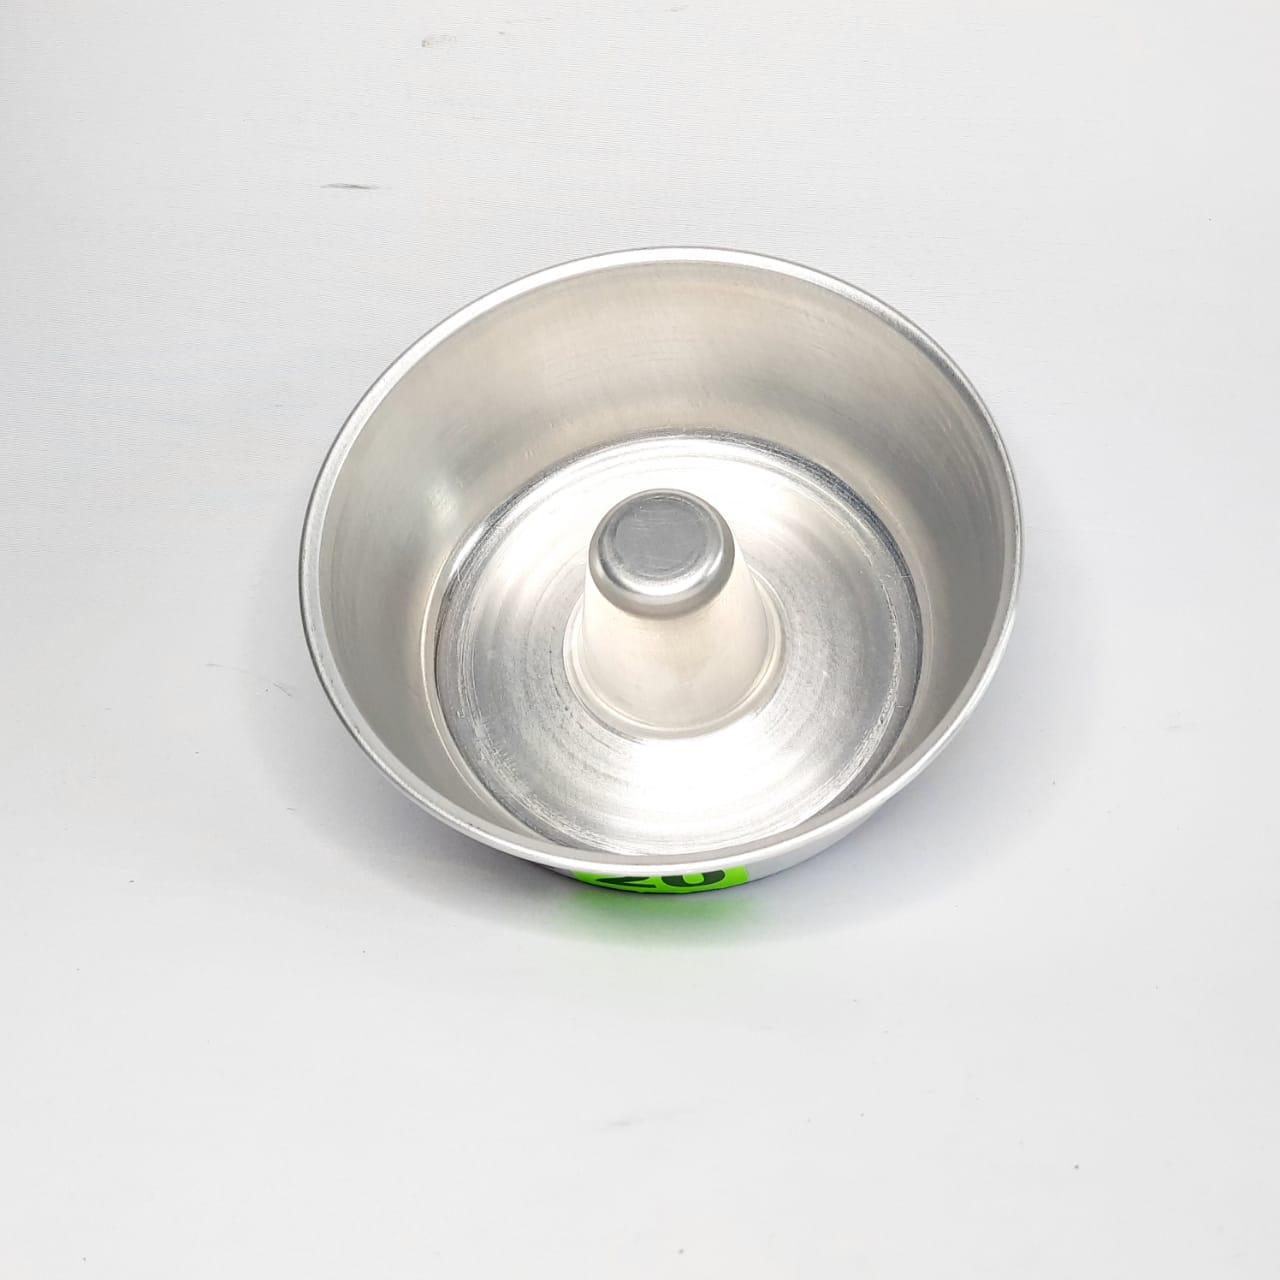 Forma Alumínio Bolo/Pudim N 20 Real